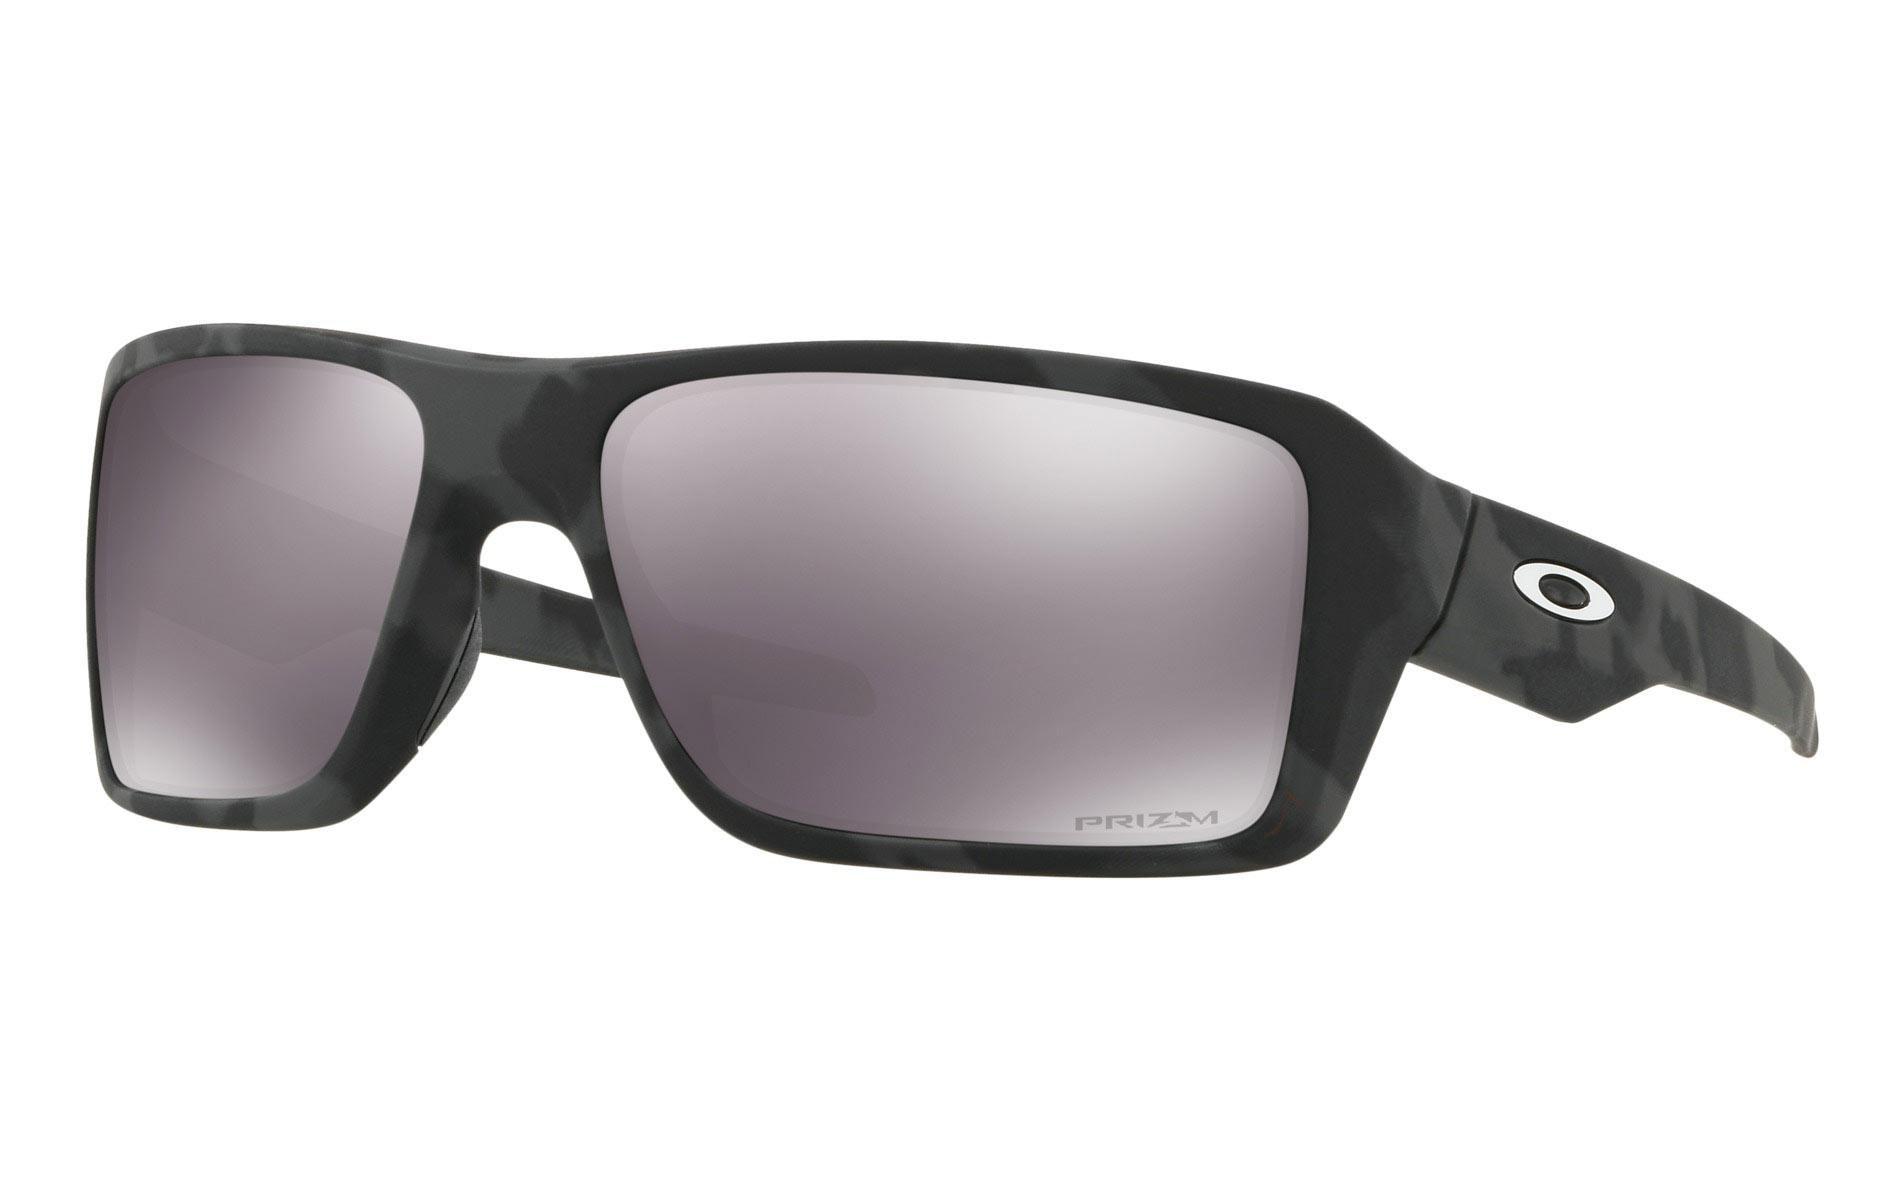 edbb5498d12b7 Óculos de Sol Oakley Double Edge OO9380-2066 - Omega Ótica e Relojoaria